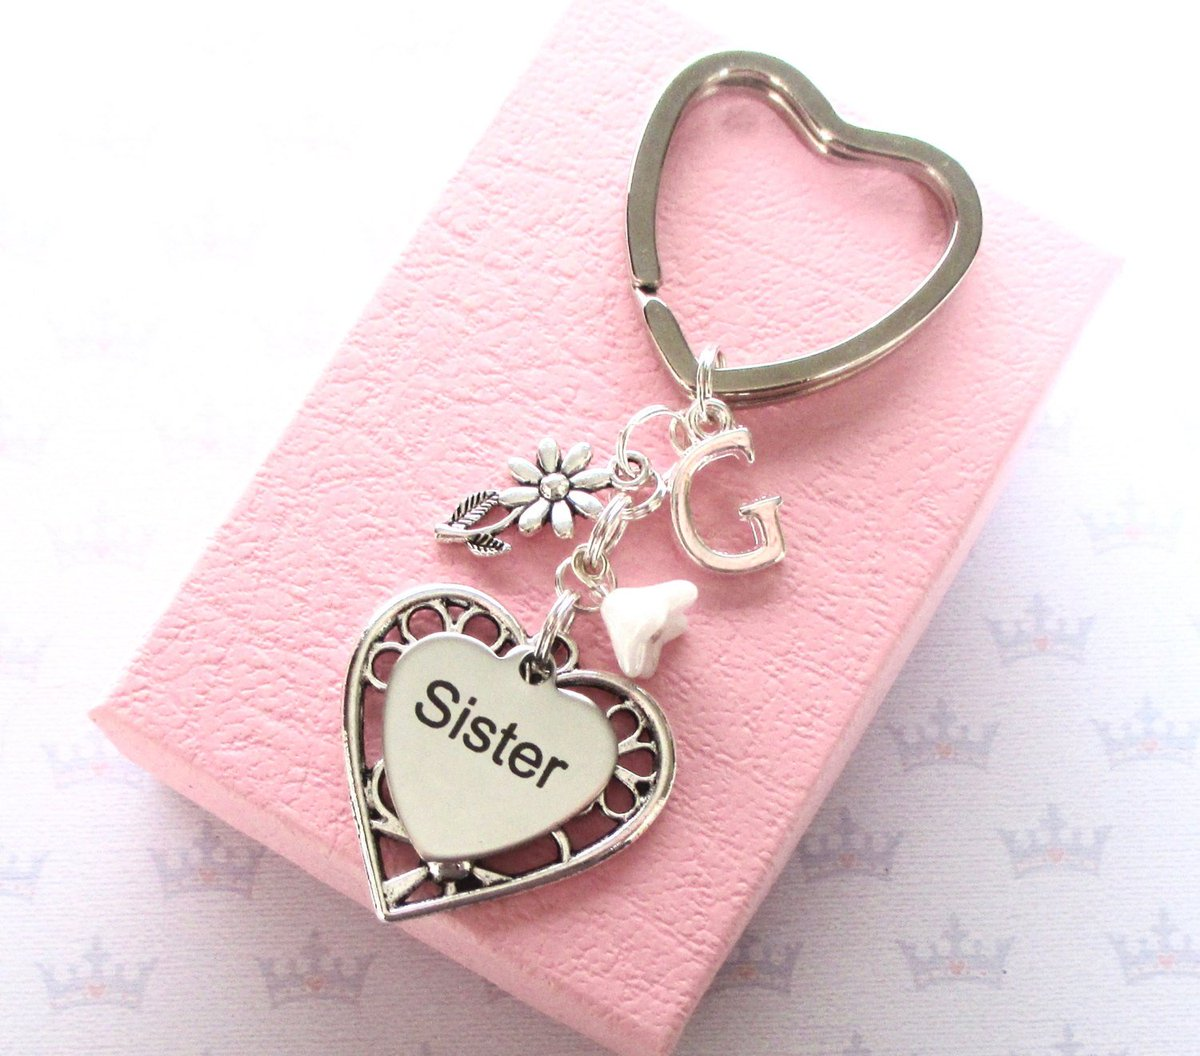 Sister gift - Daisy keyring - Personalised Sister keyring -…  http:// tuppu.net/fc03d32  &nbsp;   #DoodlepopDesigns #Personalised <br>http://pic.twitter.com/jiVj9E1x5W